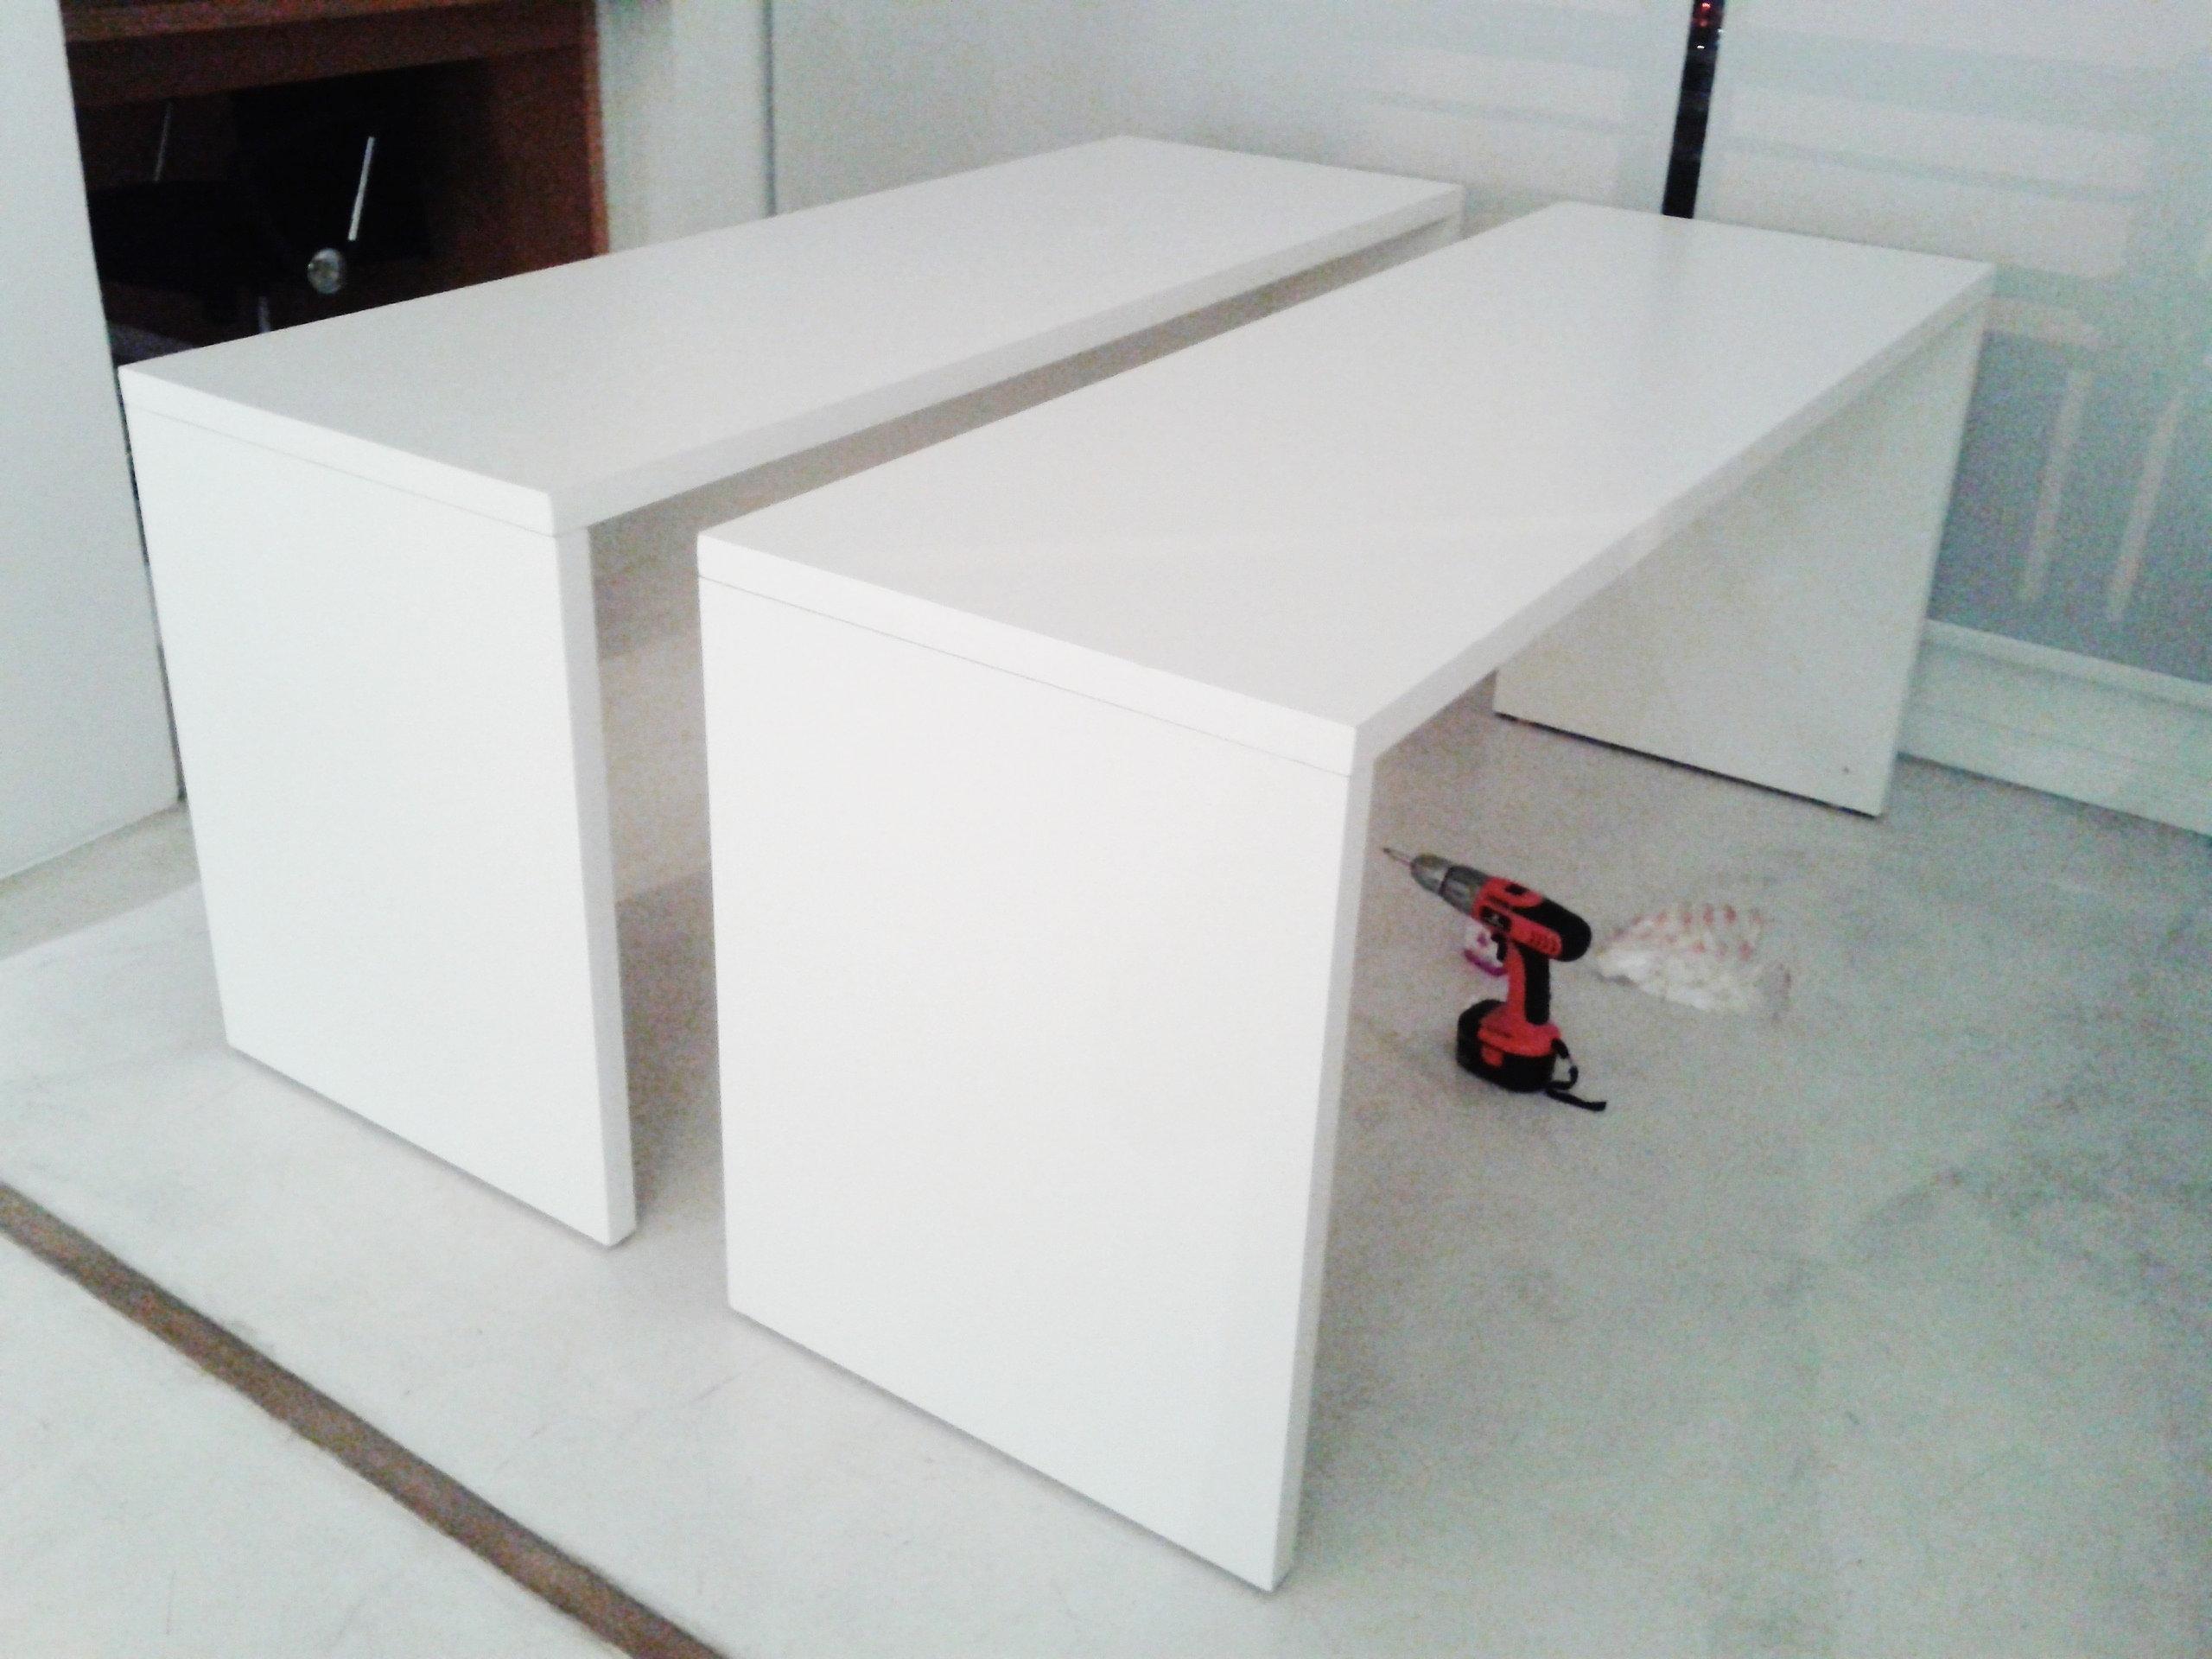 Malibu muebles for Malibu muebles